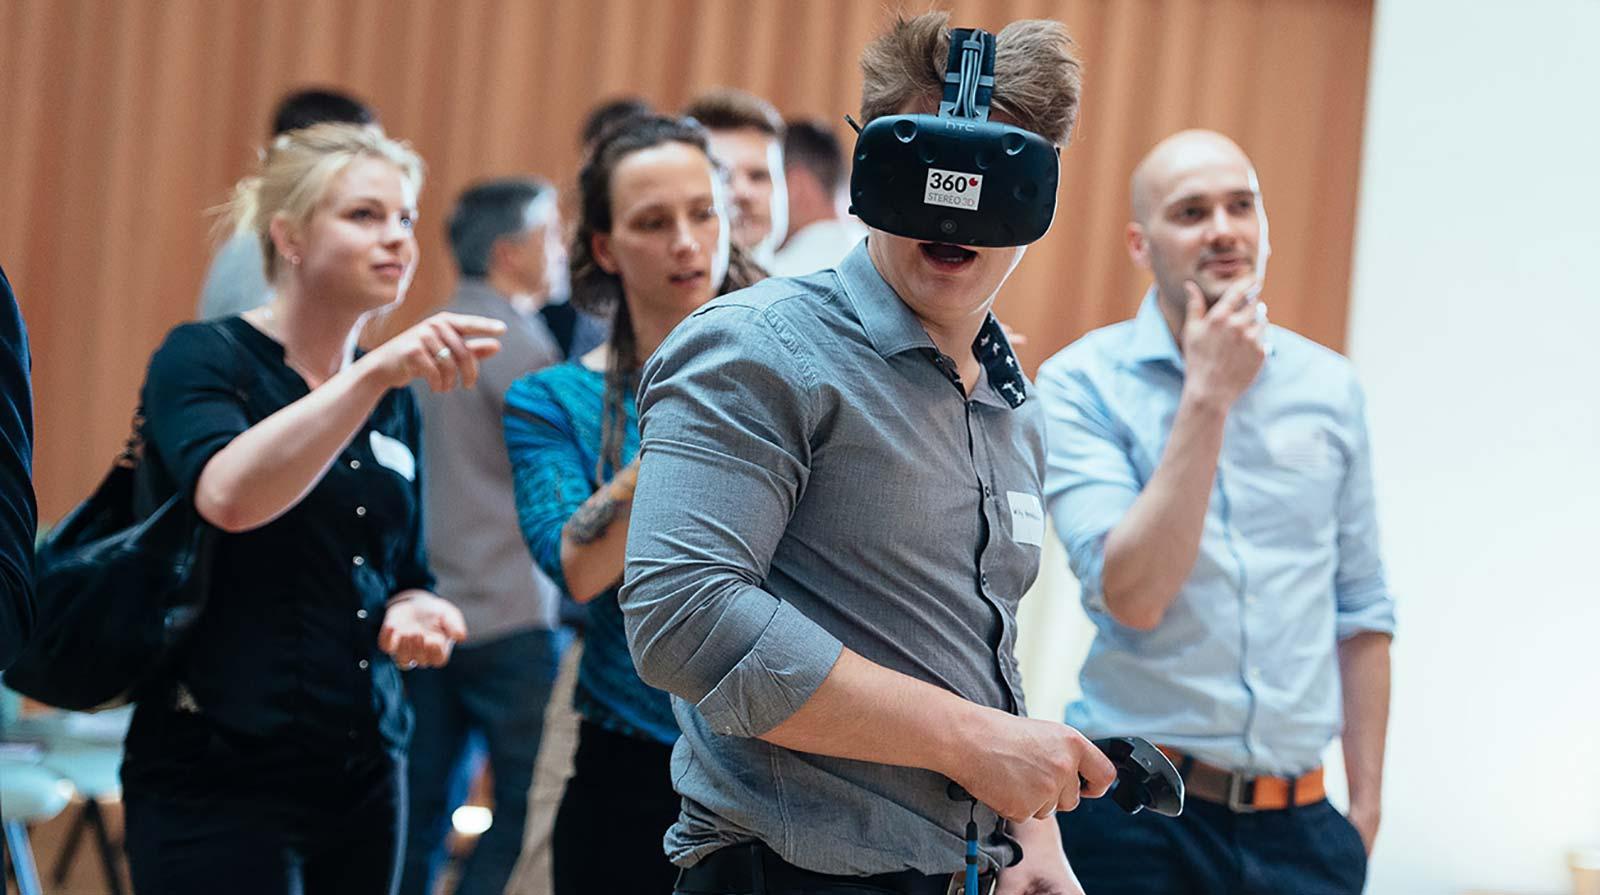 360stereo3d-virtuelle-realitaet-vr-conference-2017